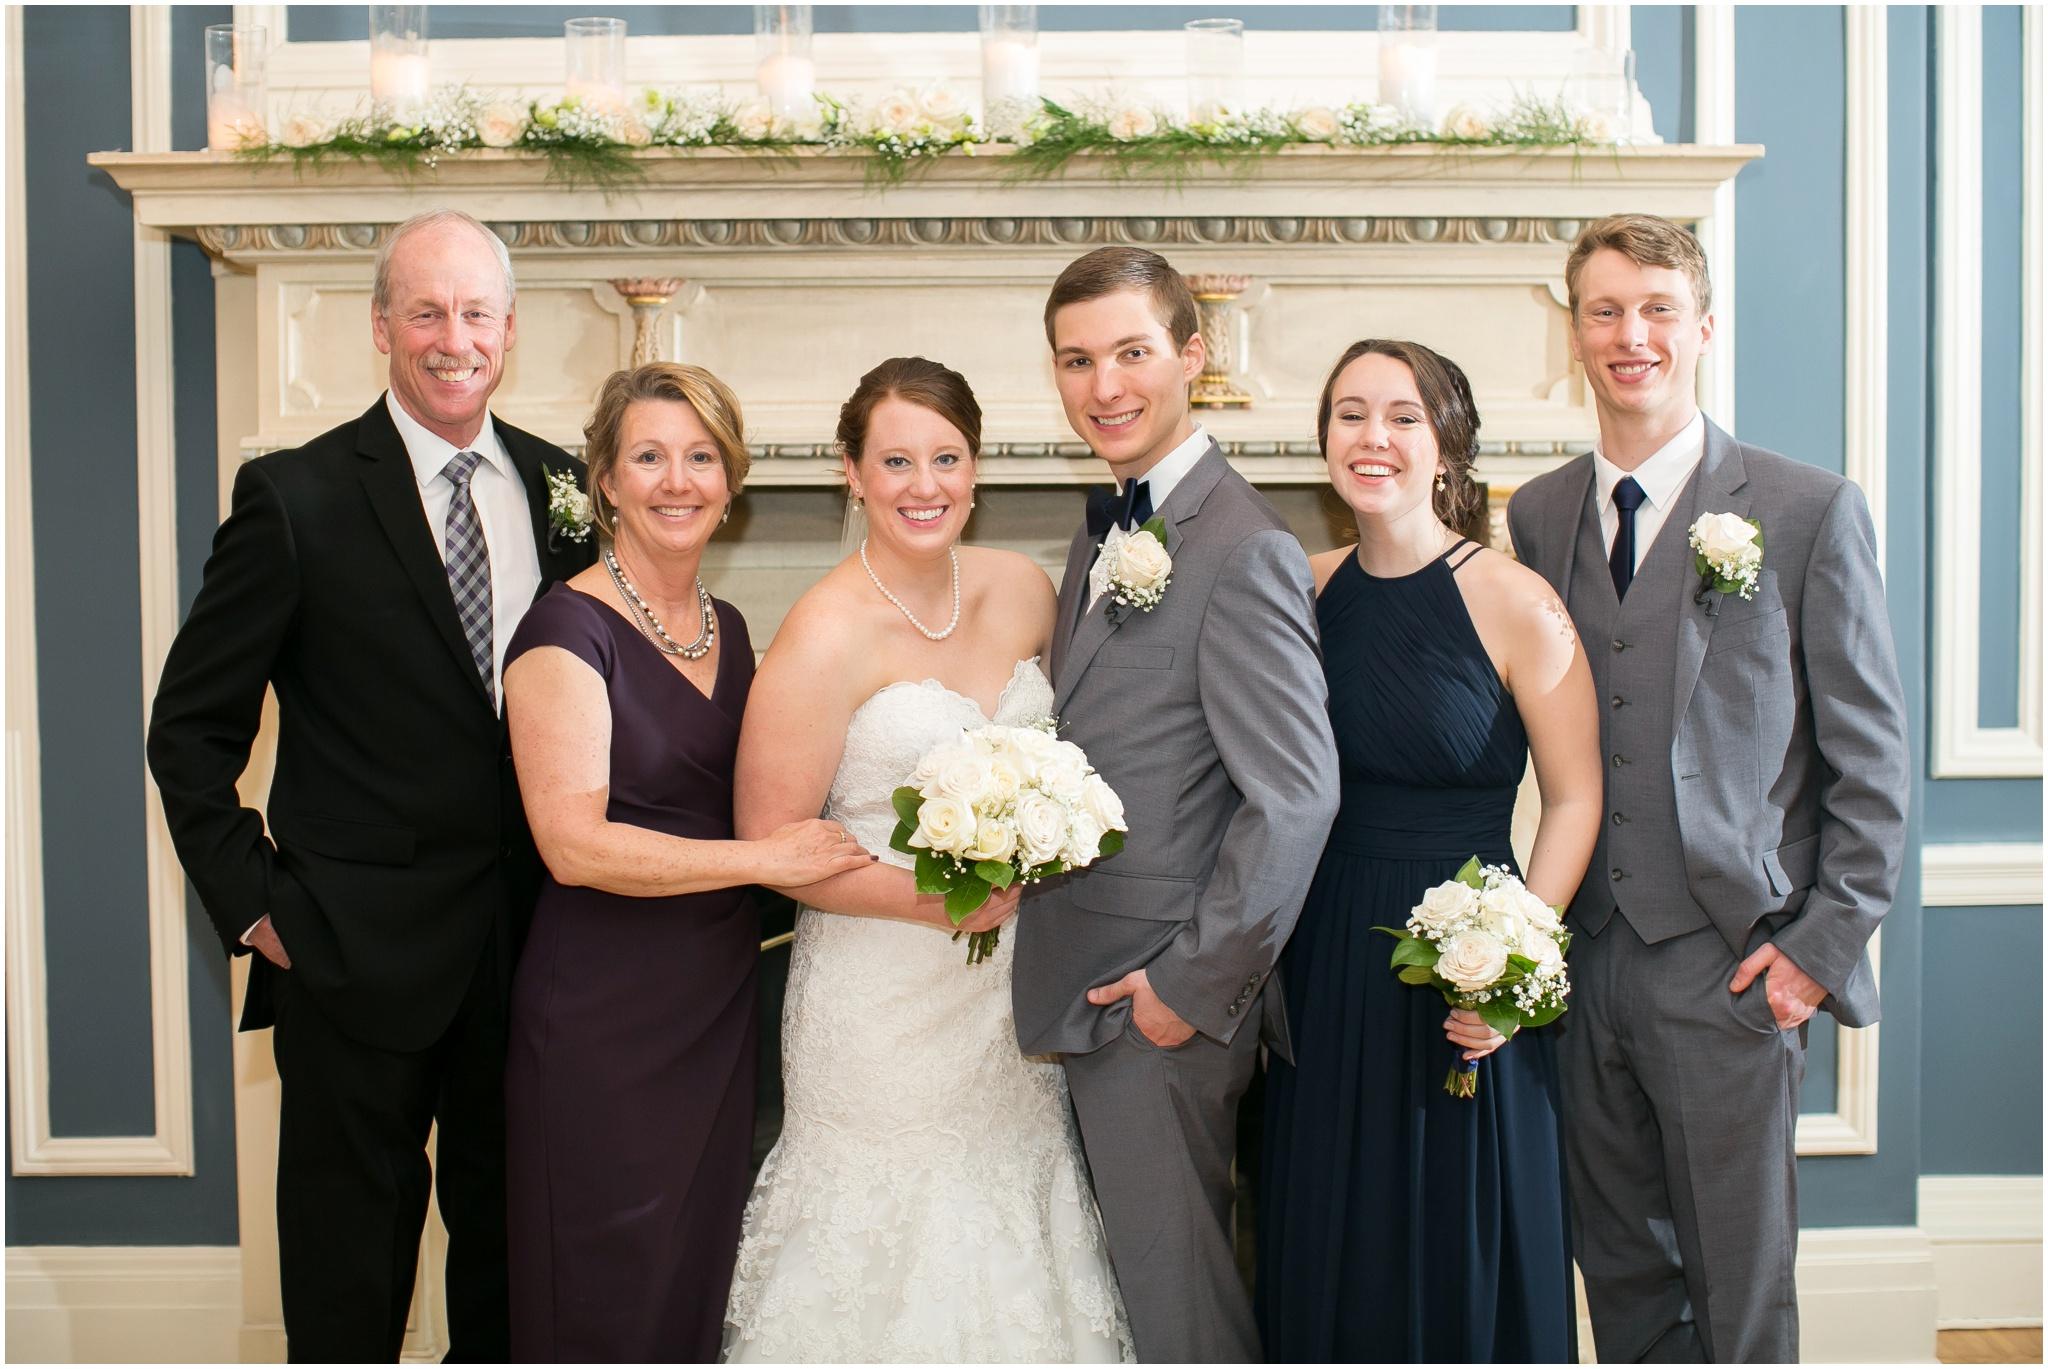 Madison_Club_Madison_Wisconsin_Wedding_Photographer_Spring_Rainy_Wedding_2643.jpg